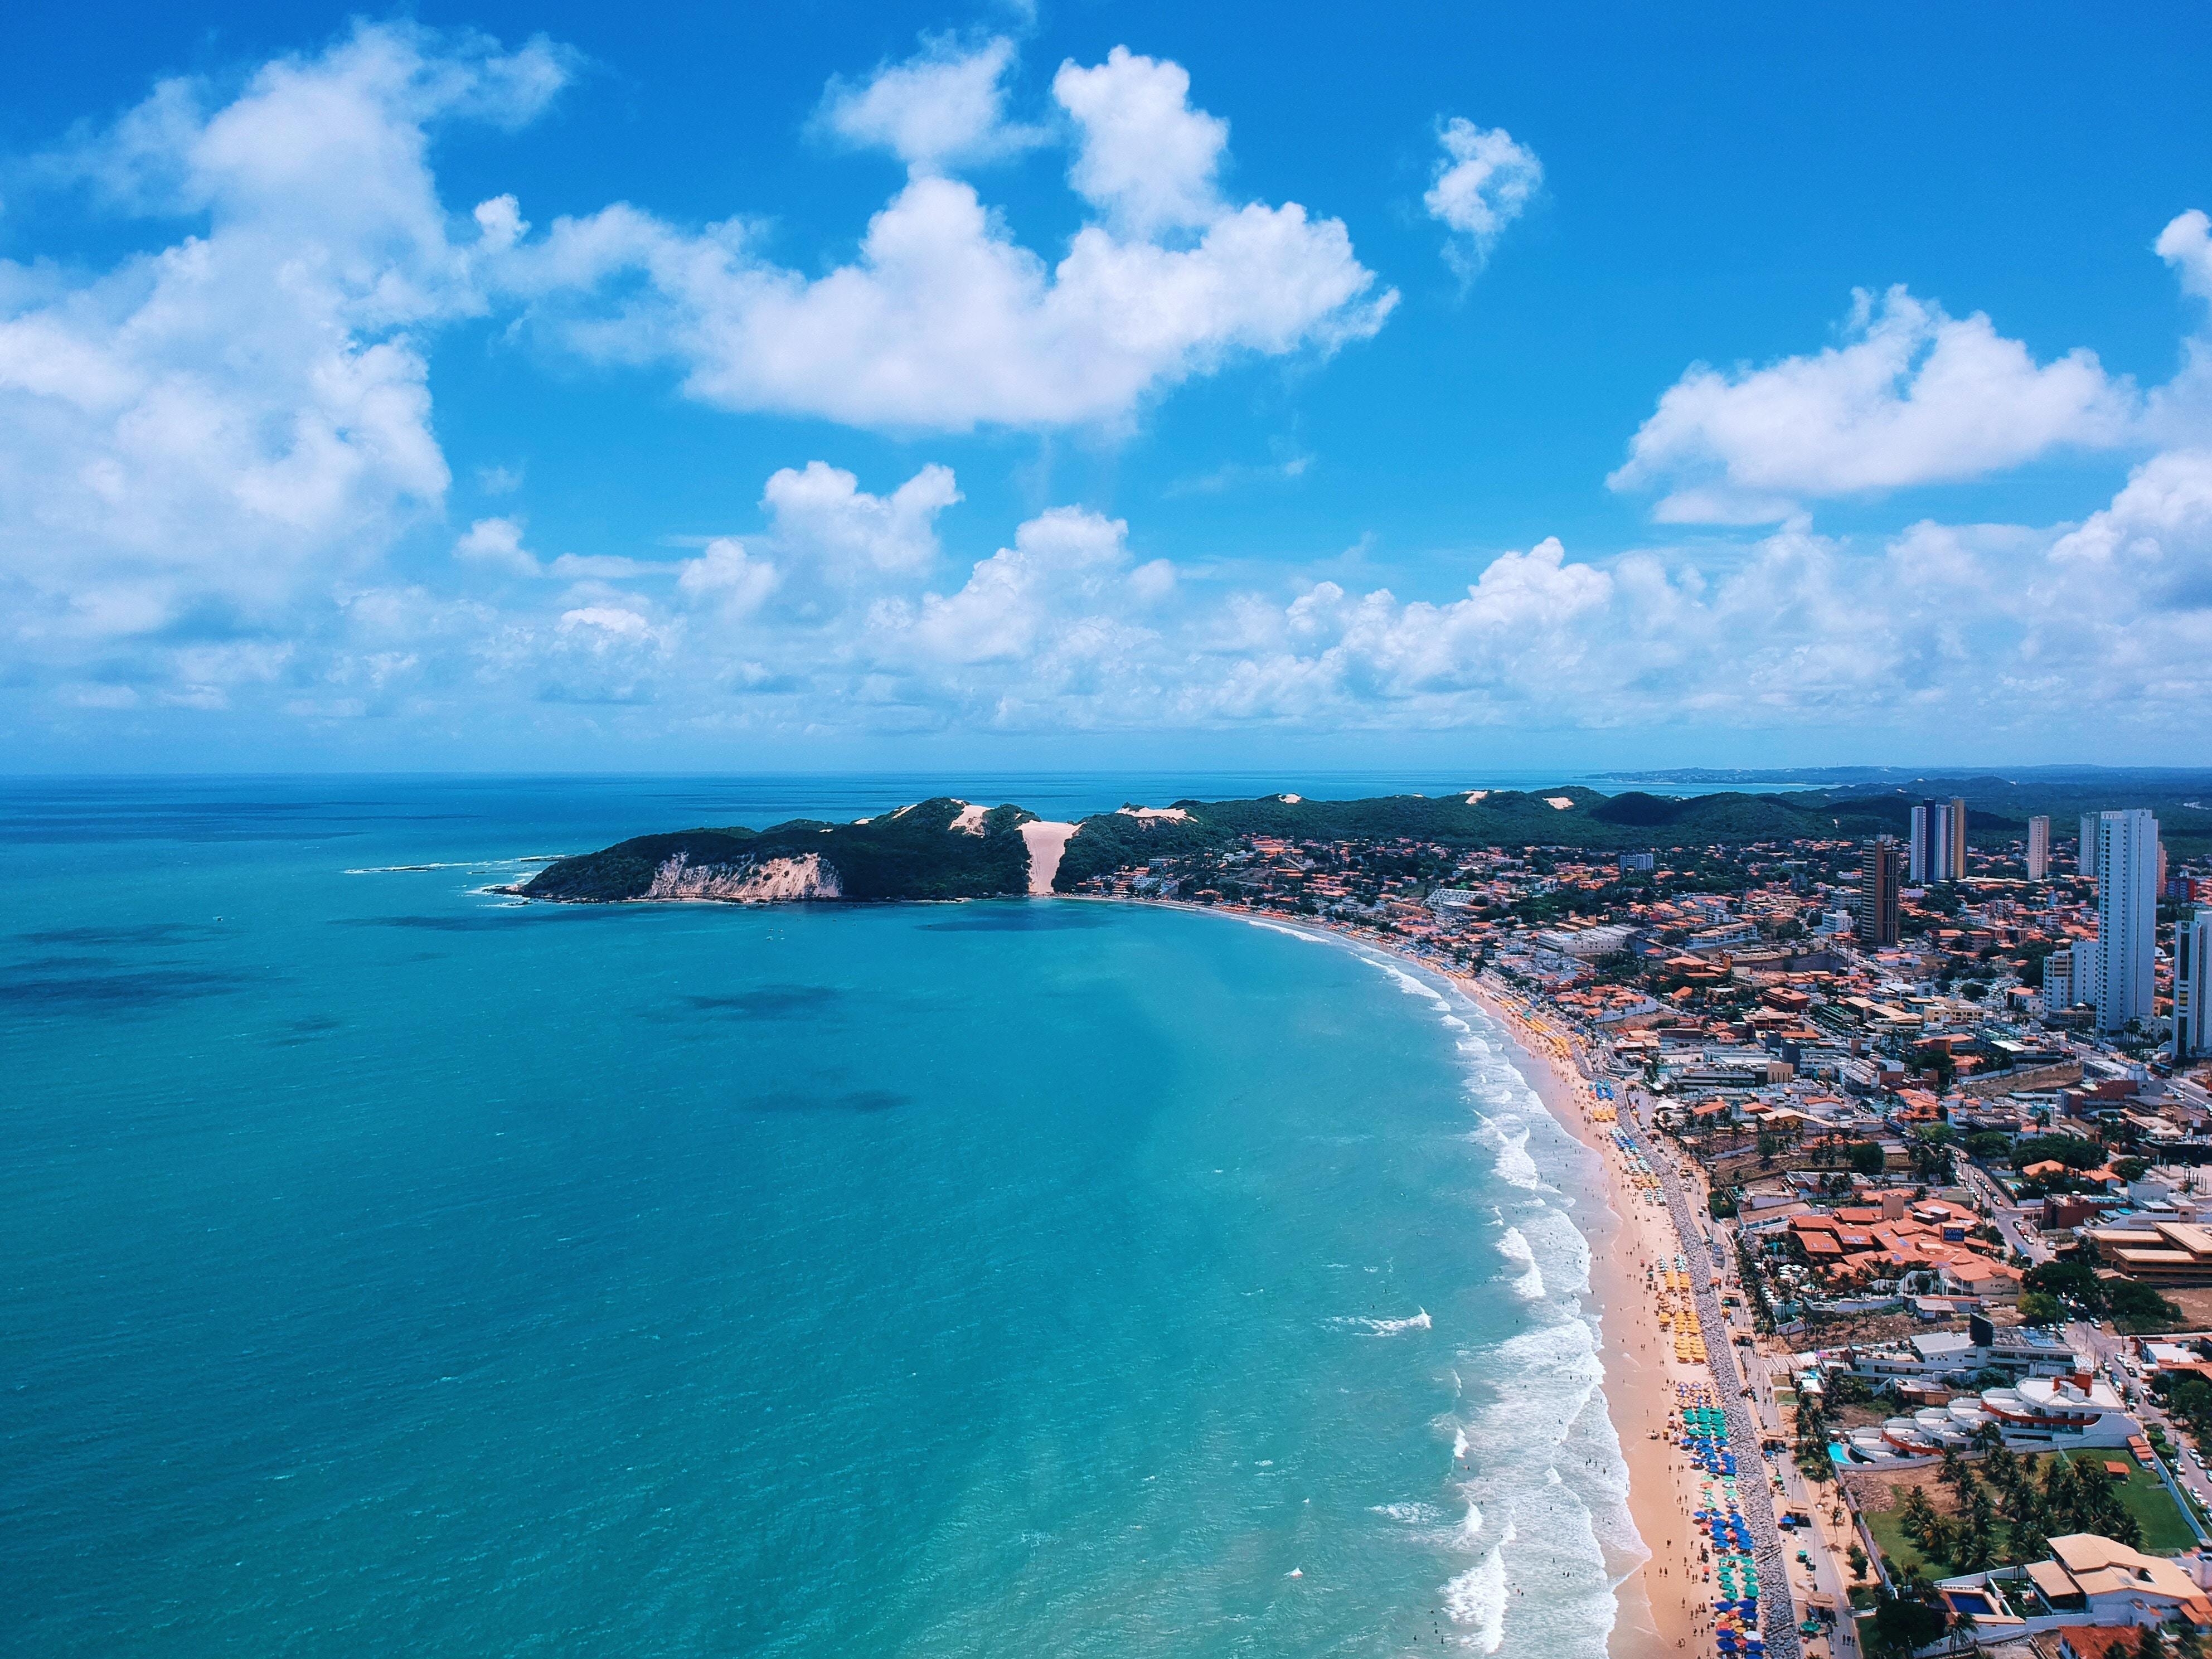 Business opportunities in Brazil